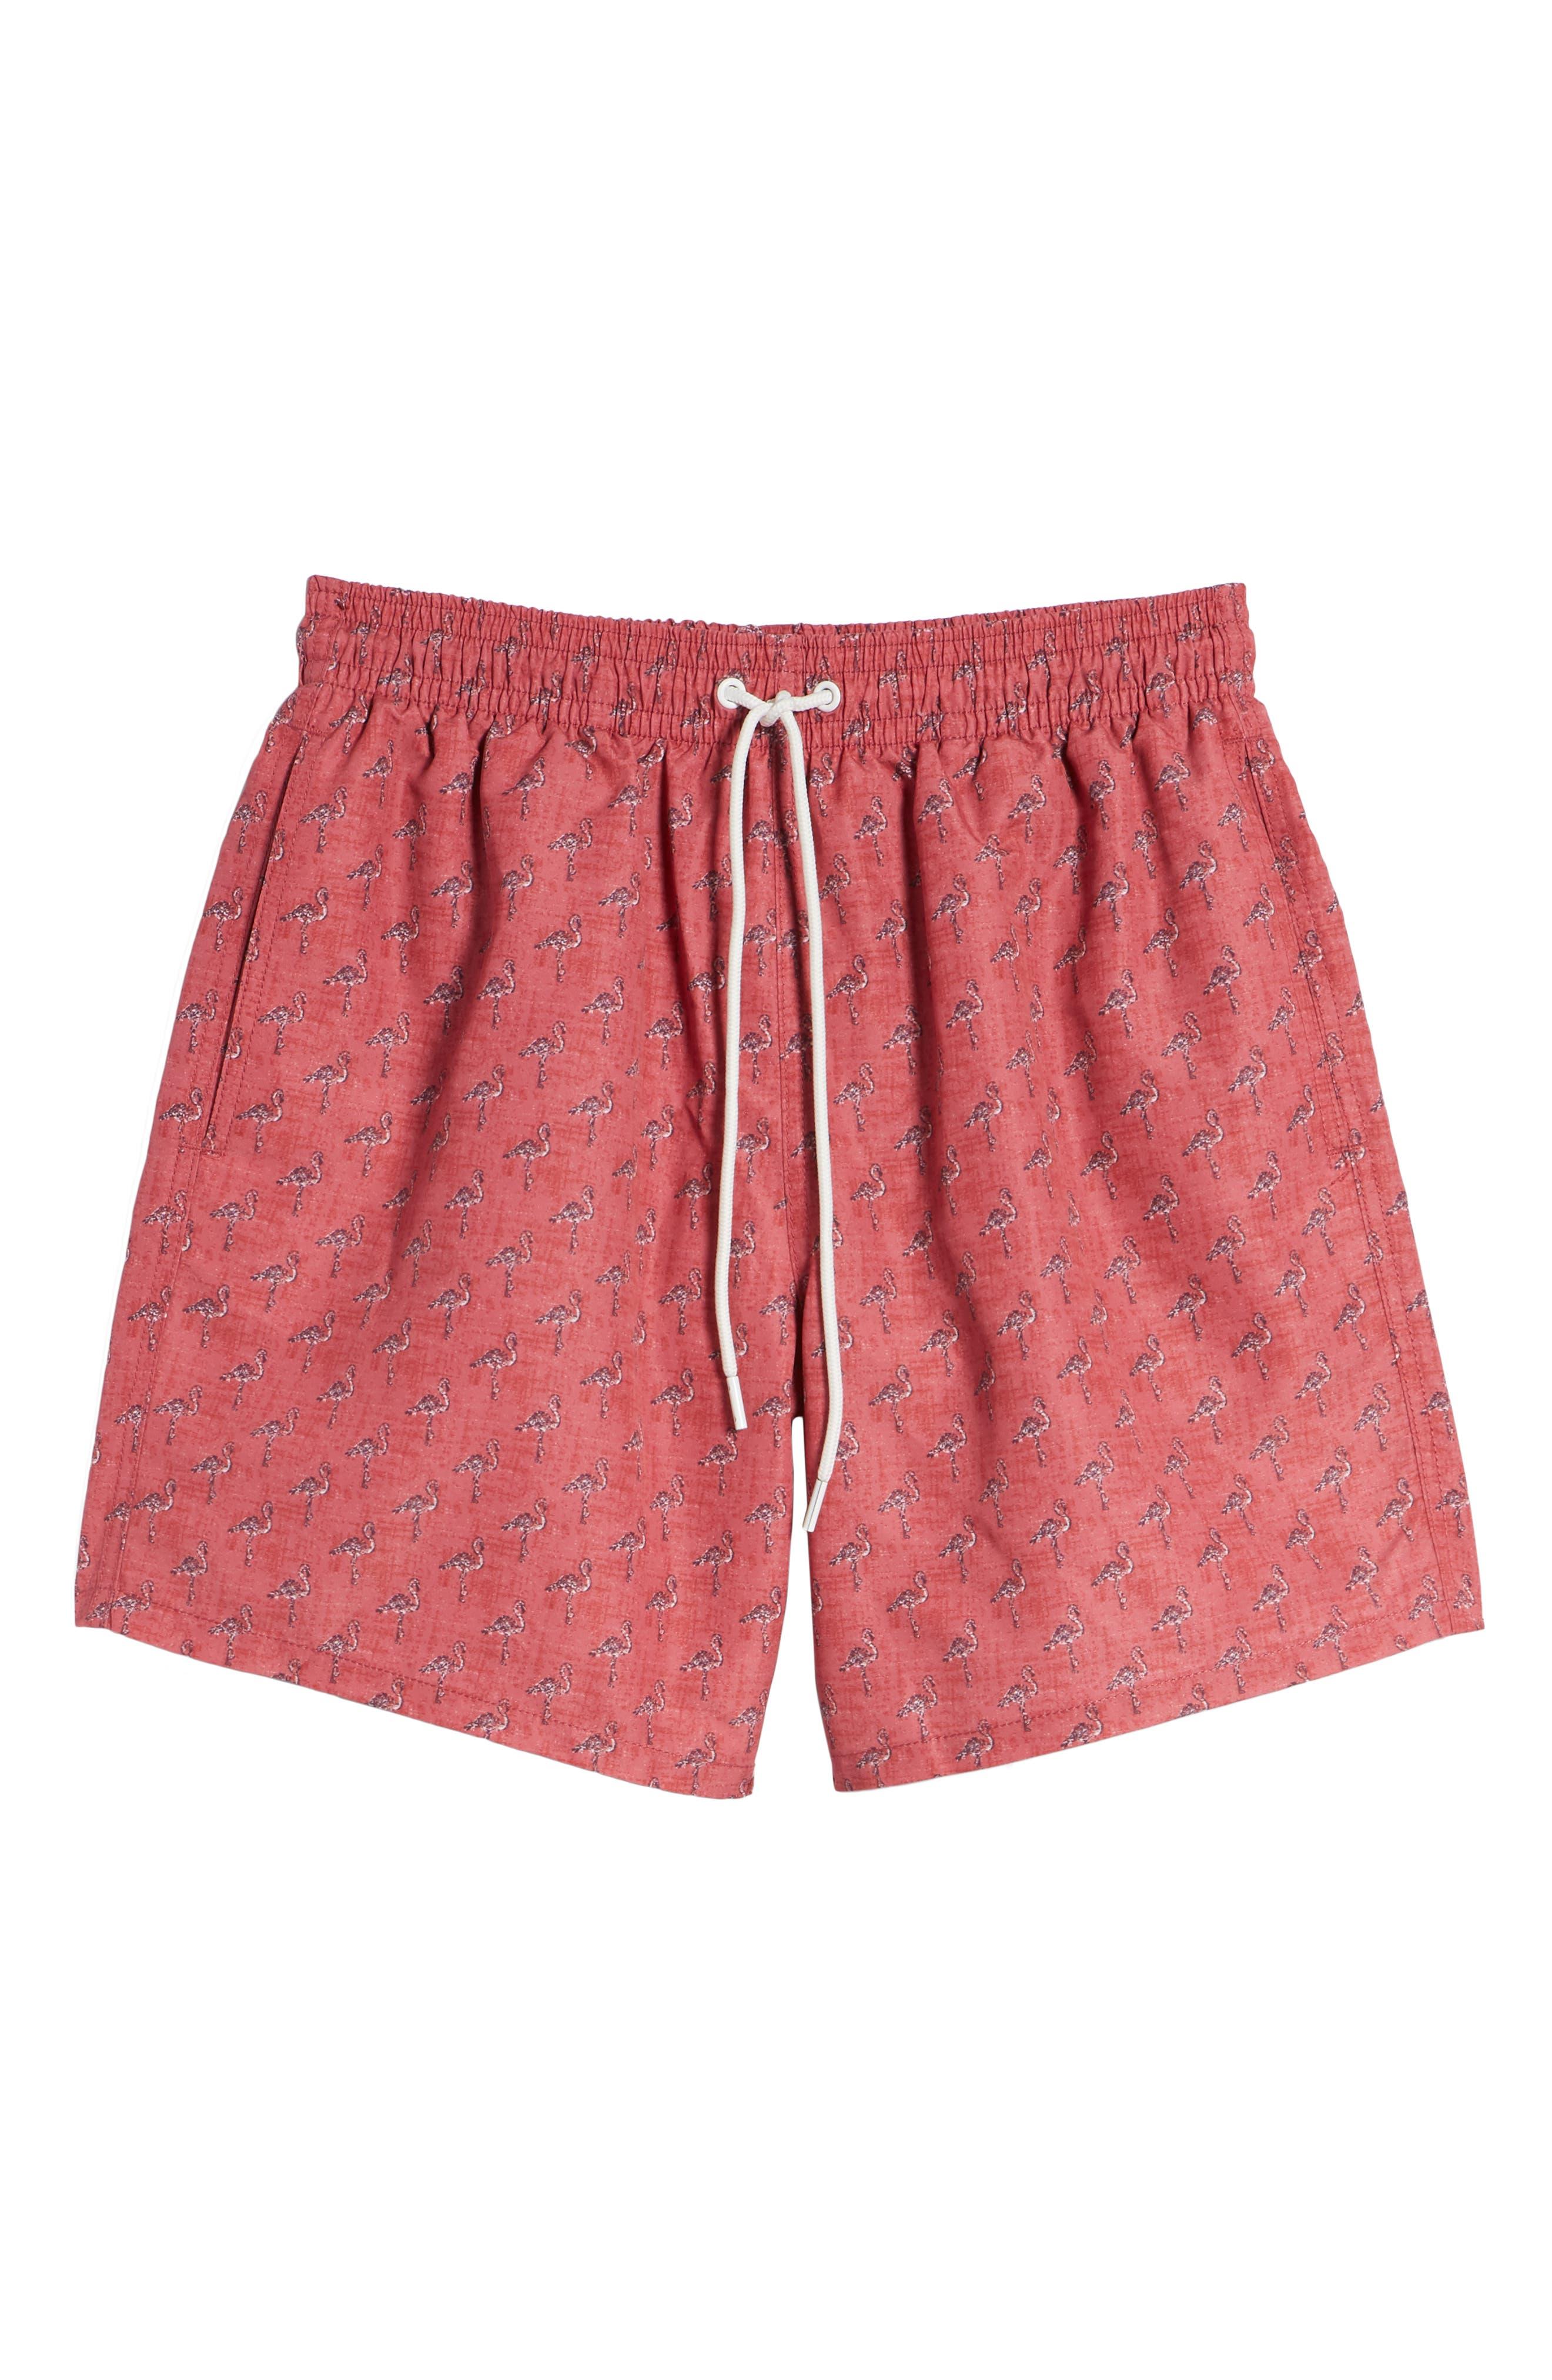 Dryden Regular Fit Print Swim Trunks,                             Alternate thumbnail 6, color,                             Pomegranate